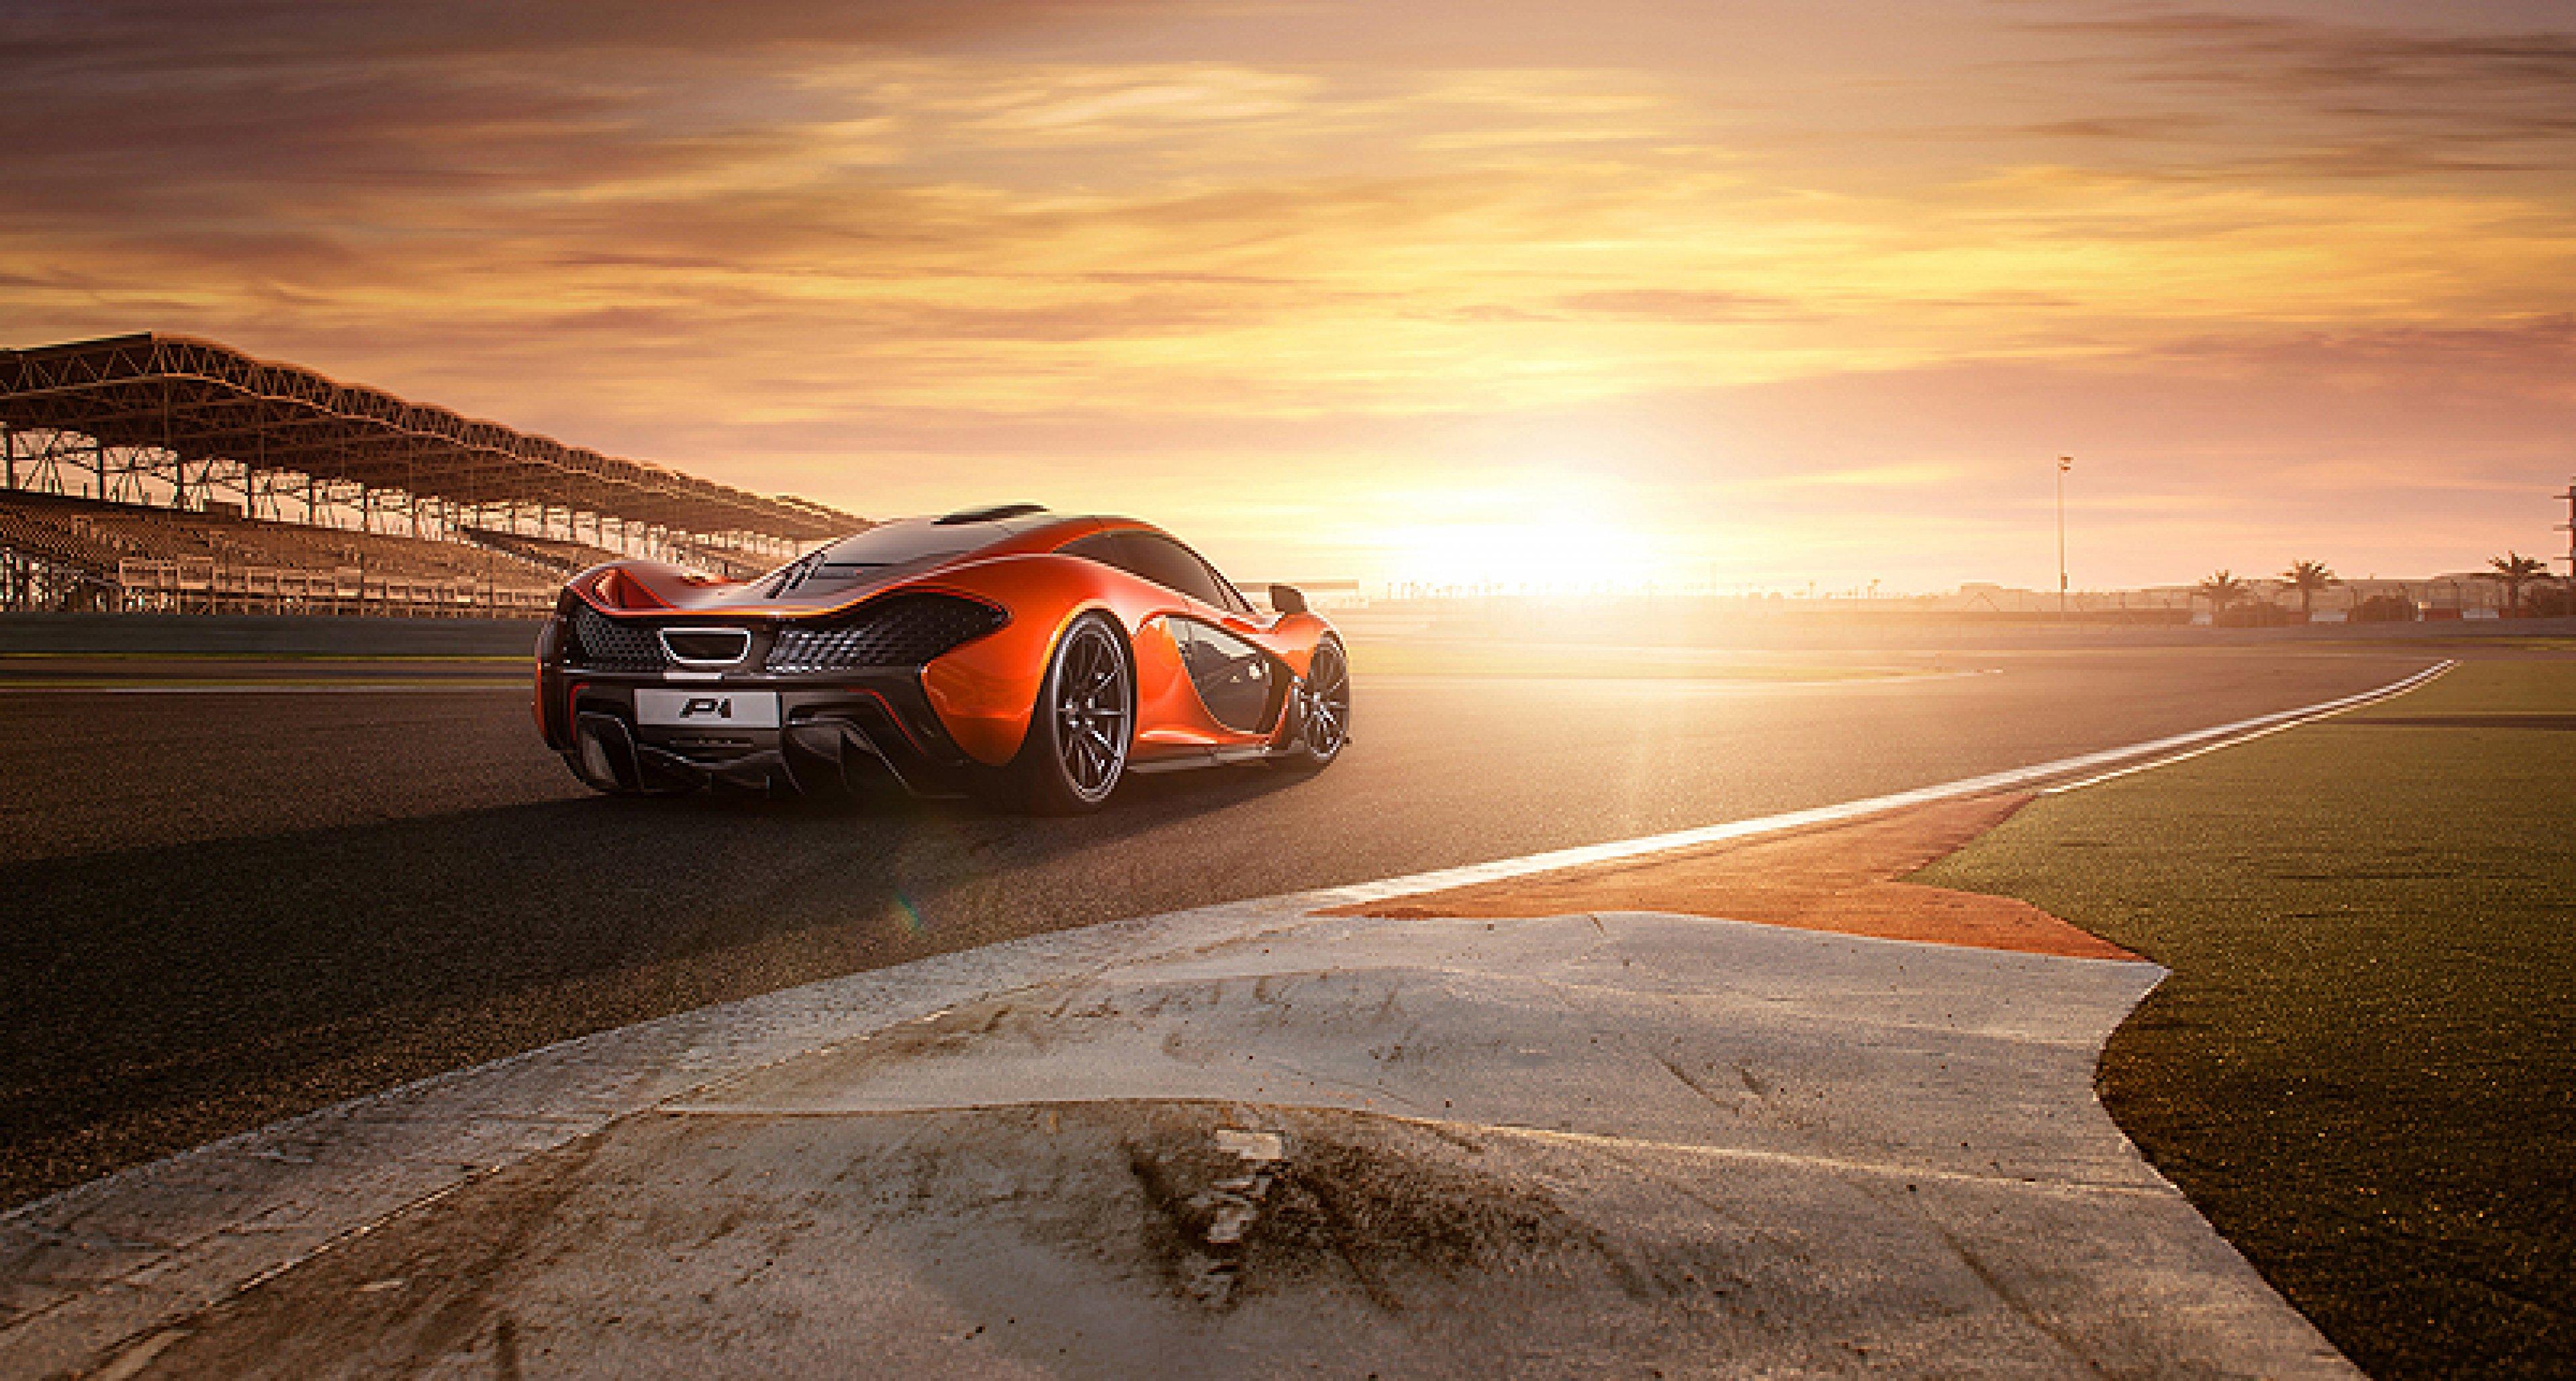 McLaren P1 on Tour in Bahrain: Photo gallery